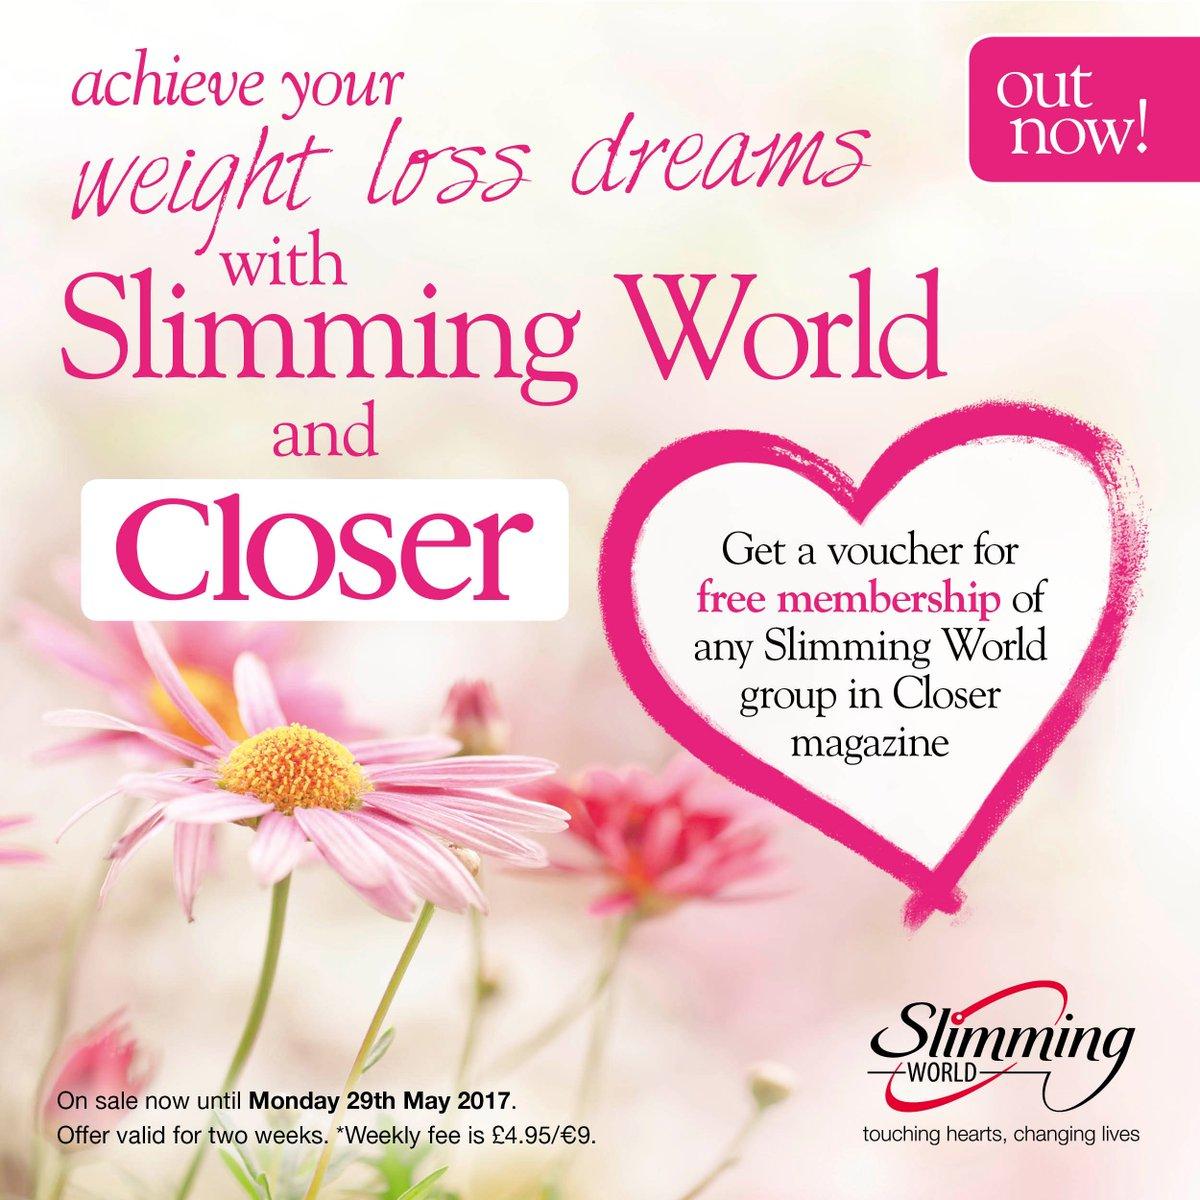 Slimming World On Twitter Get Free Slimmingworld Membership In